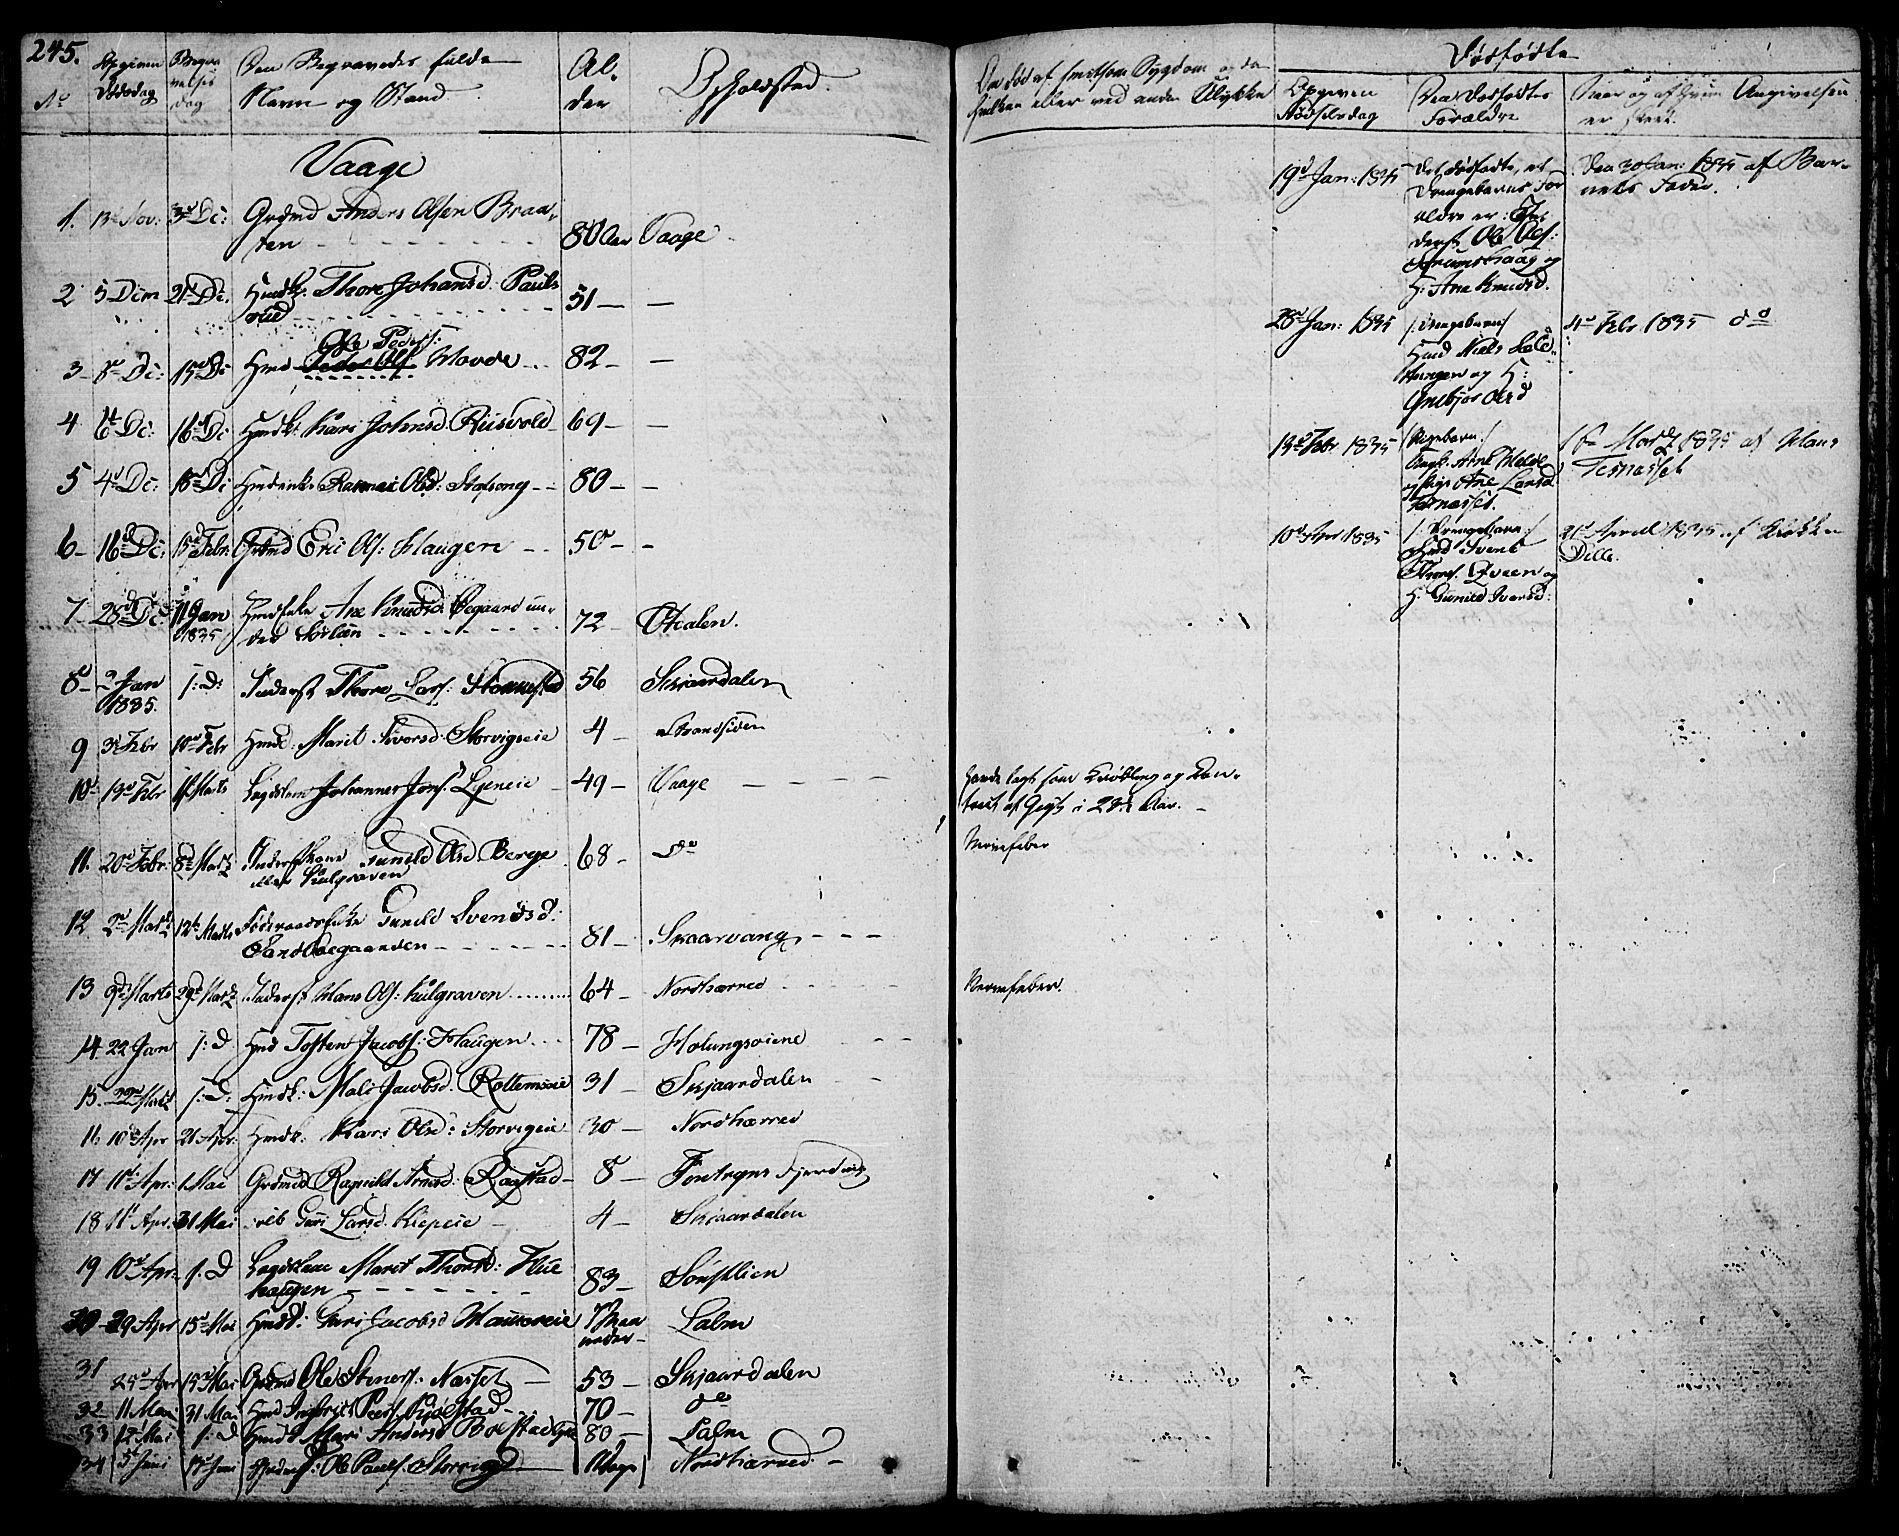 SAH, Vågå prestekontor, Ministerialbok nr. 4 /1, 1827-1842, s. 245